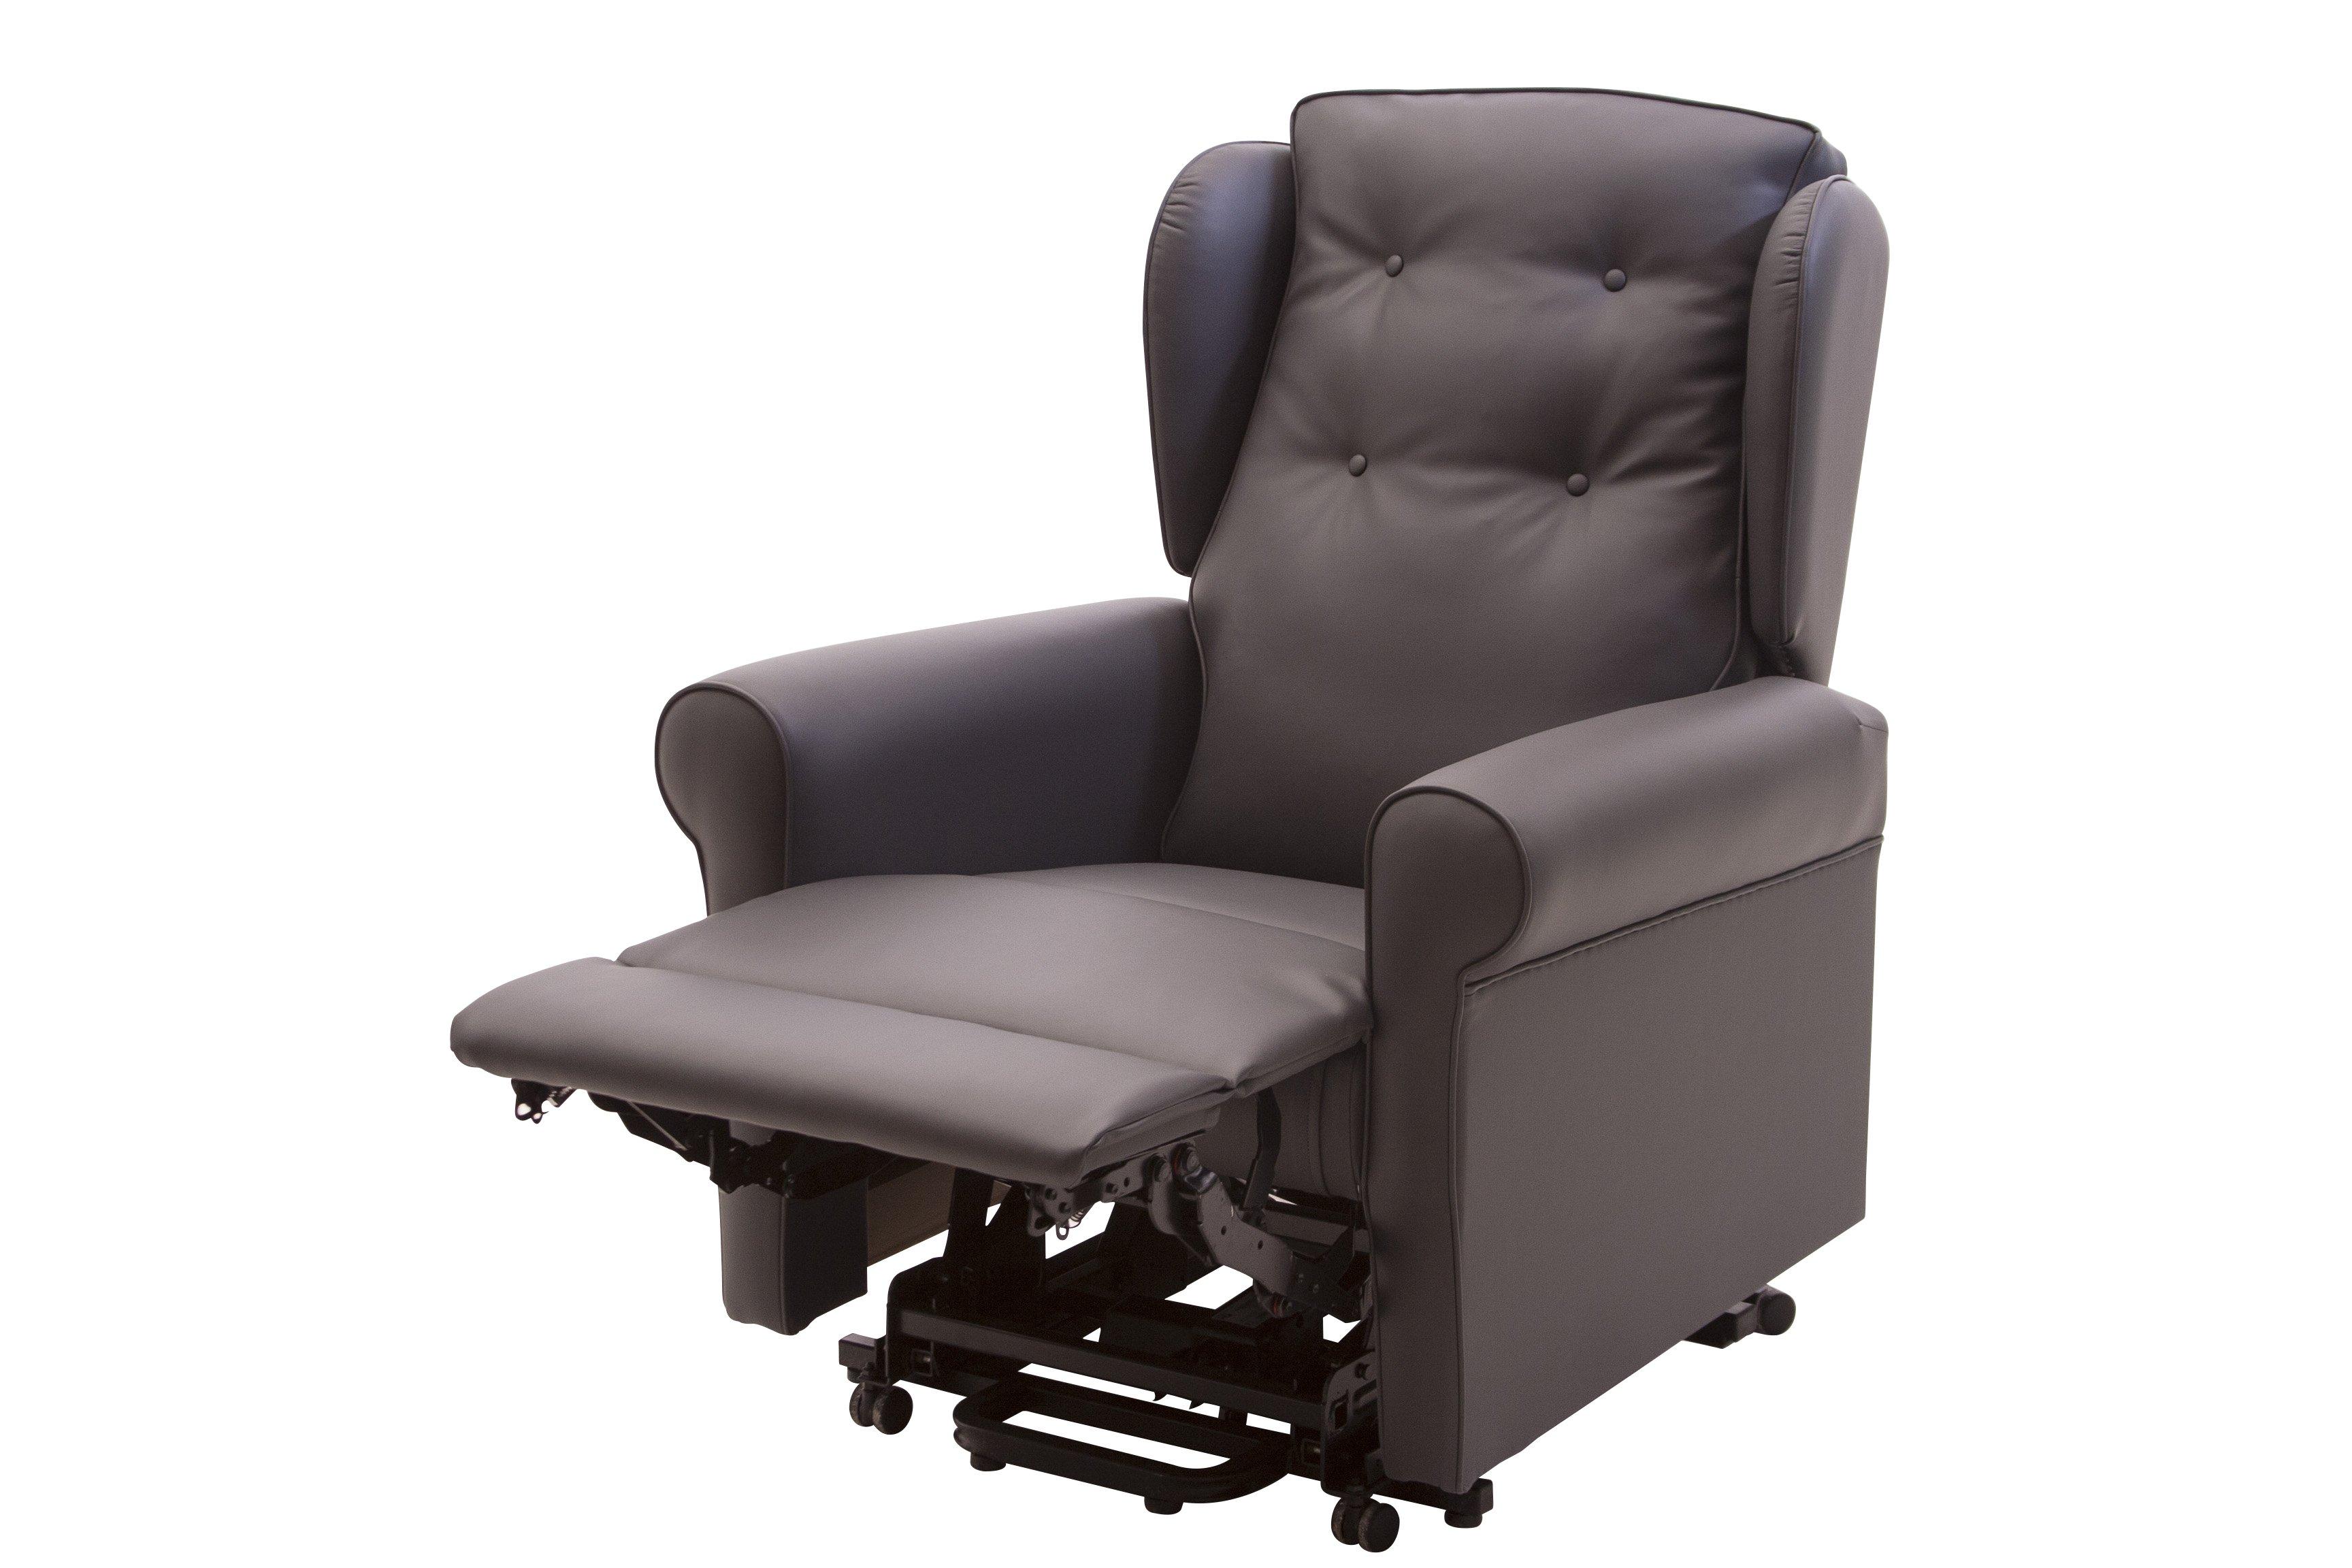 Rufford Twin Motor Lift Rise Recline Chair